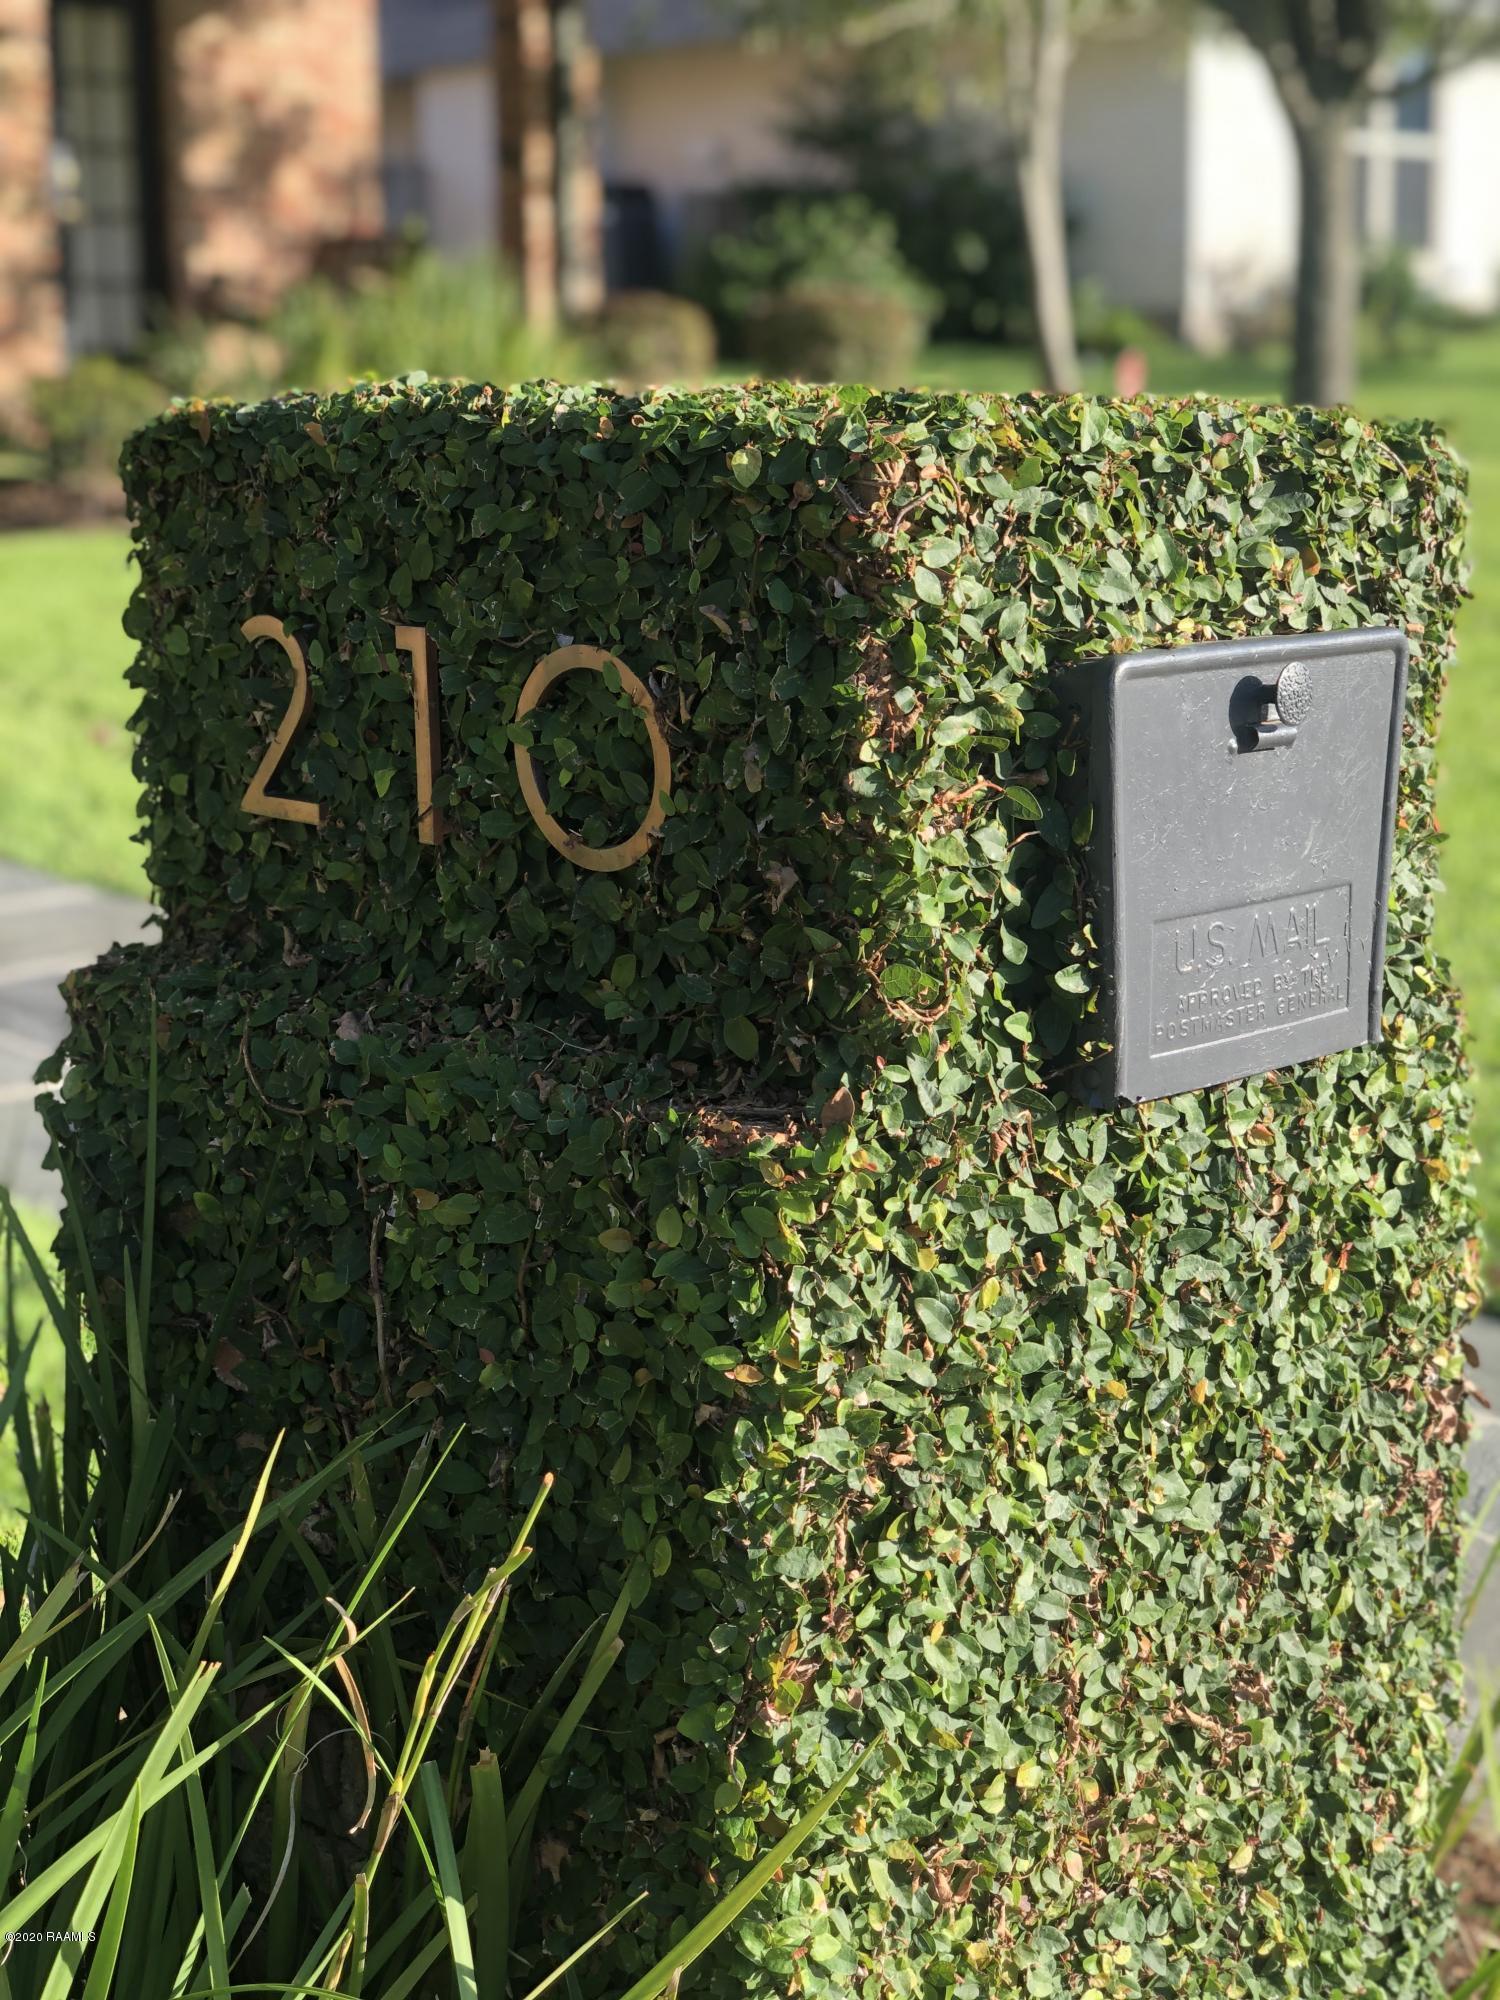 210 Clem Drive, Lafayette, LA 70503 Photo #4